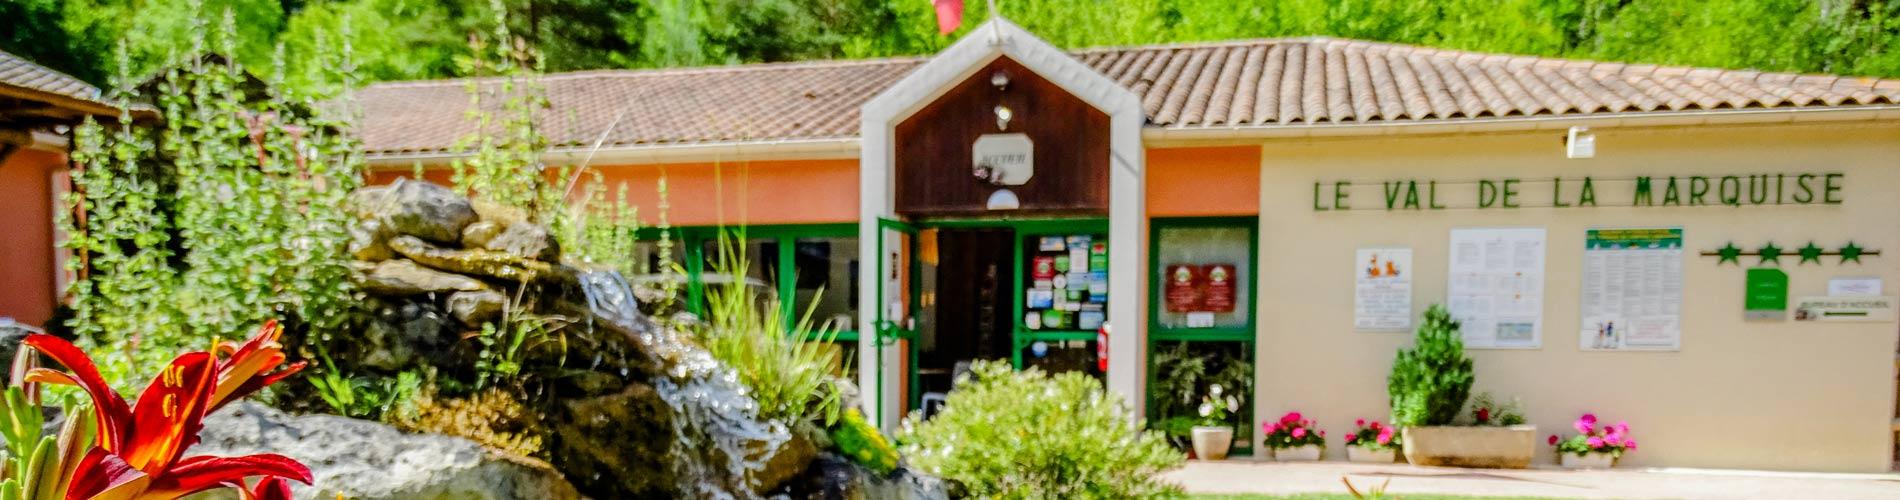 Dordogne camping 4 étoiles